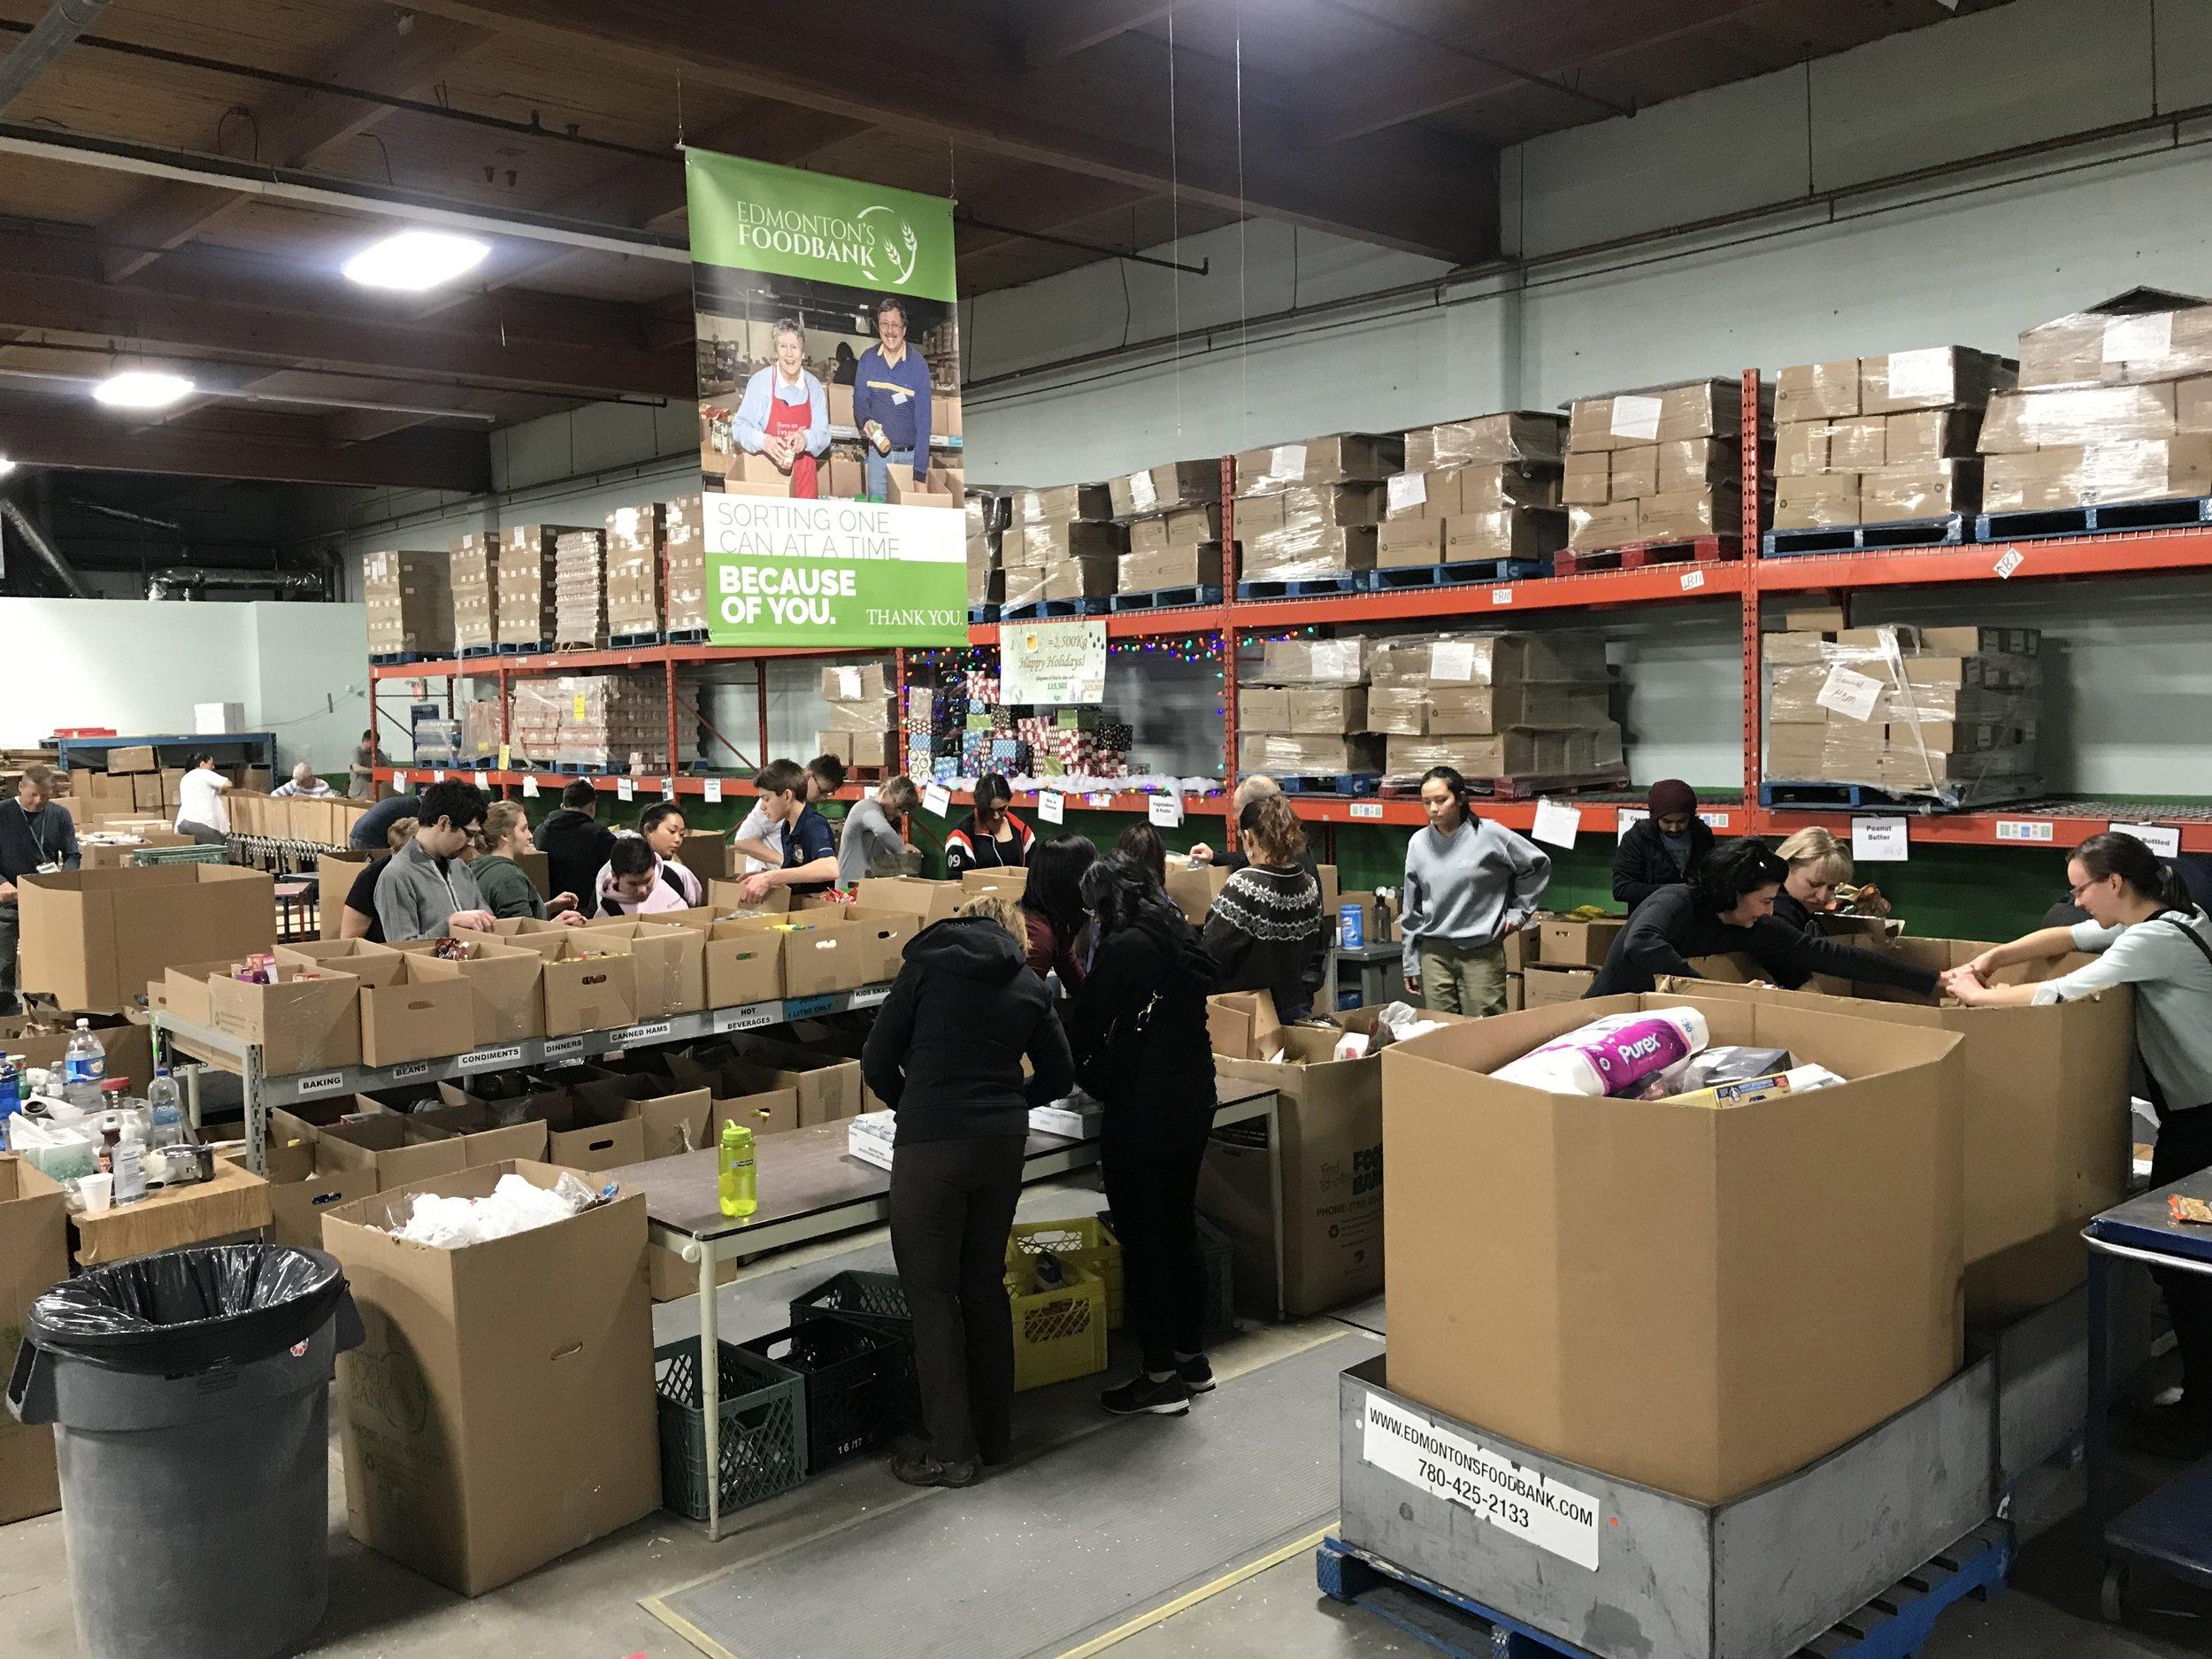 Volunteers sorting donations at the Food Bank